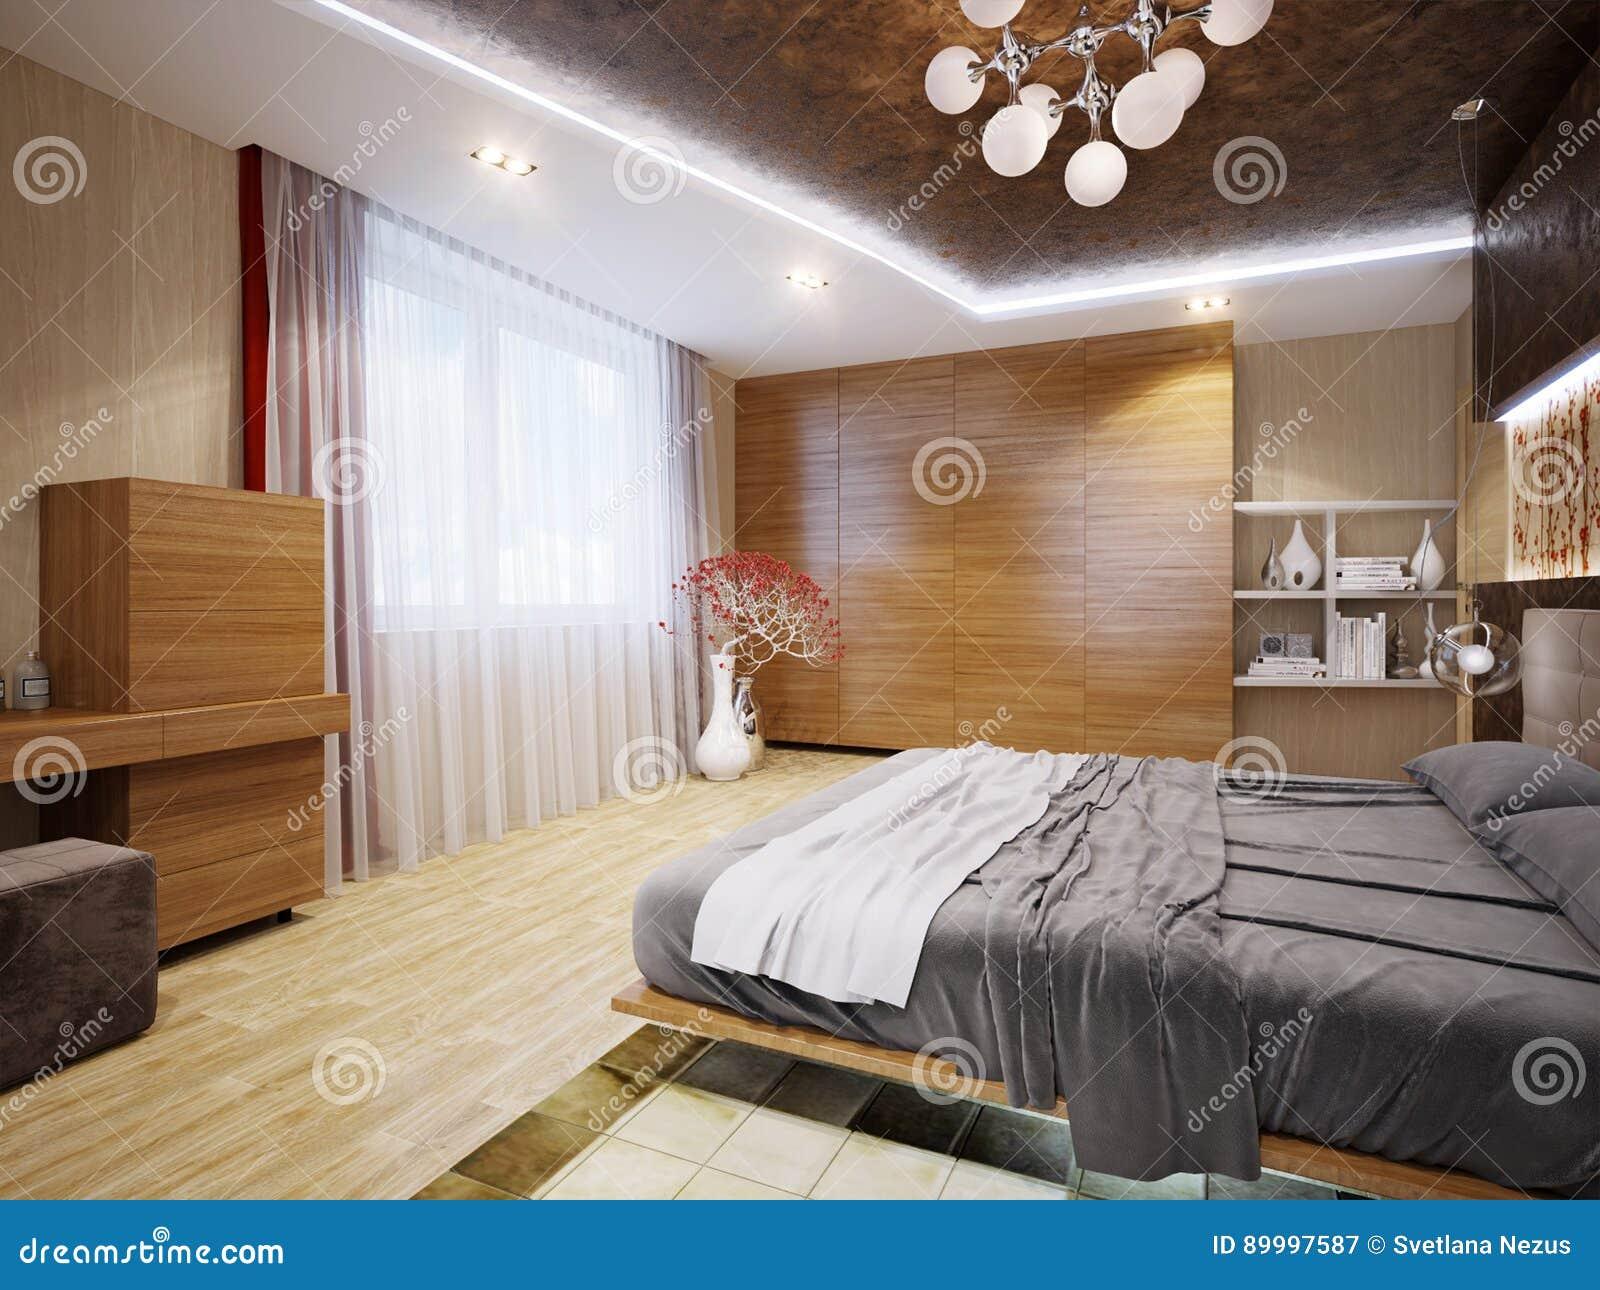 . Modern Bedroom Interior Design With Japanese Motifs Stock